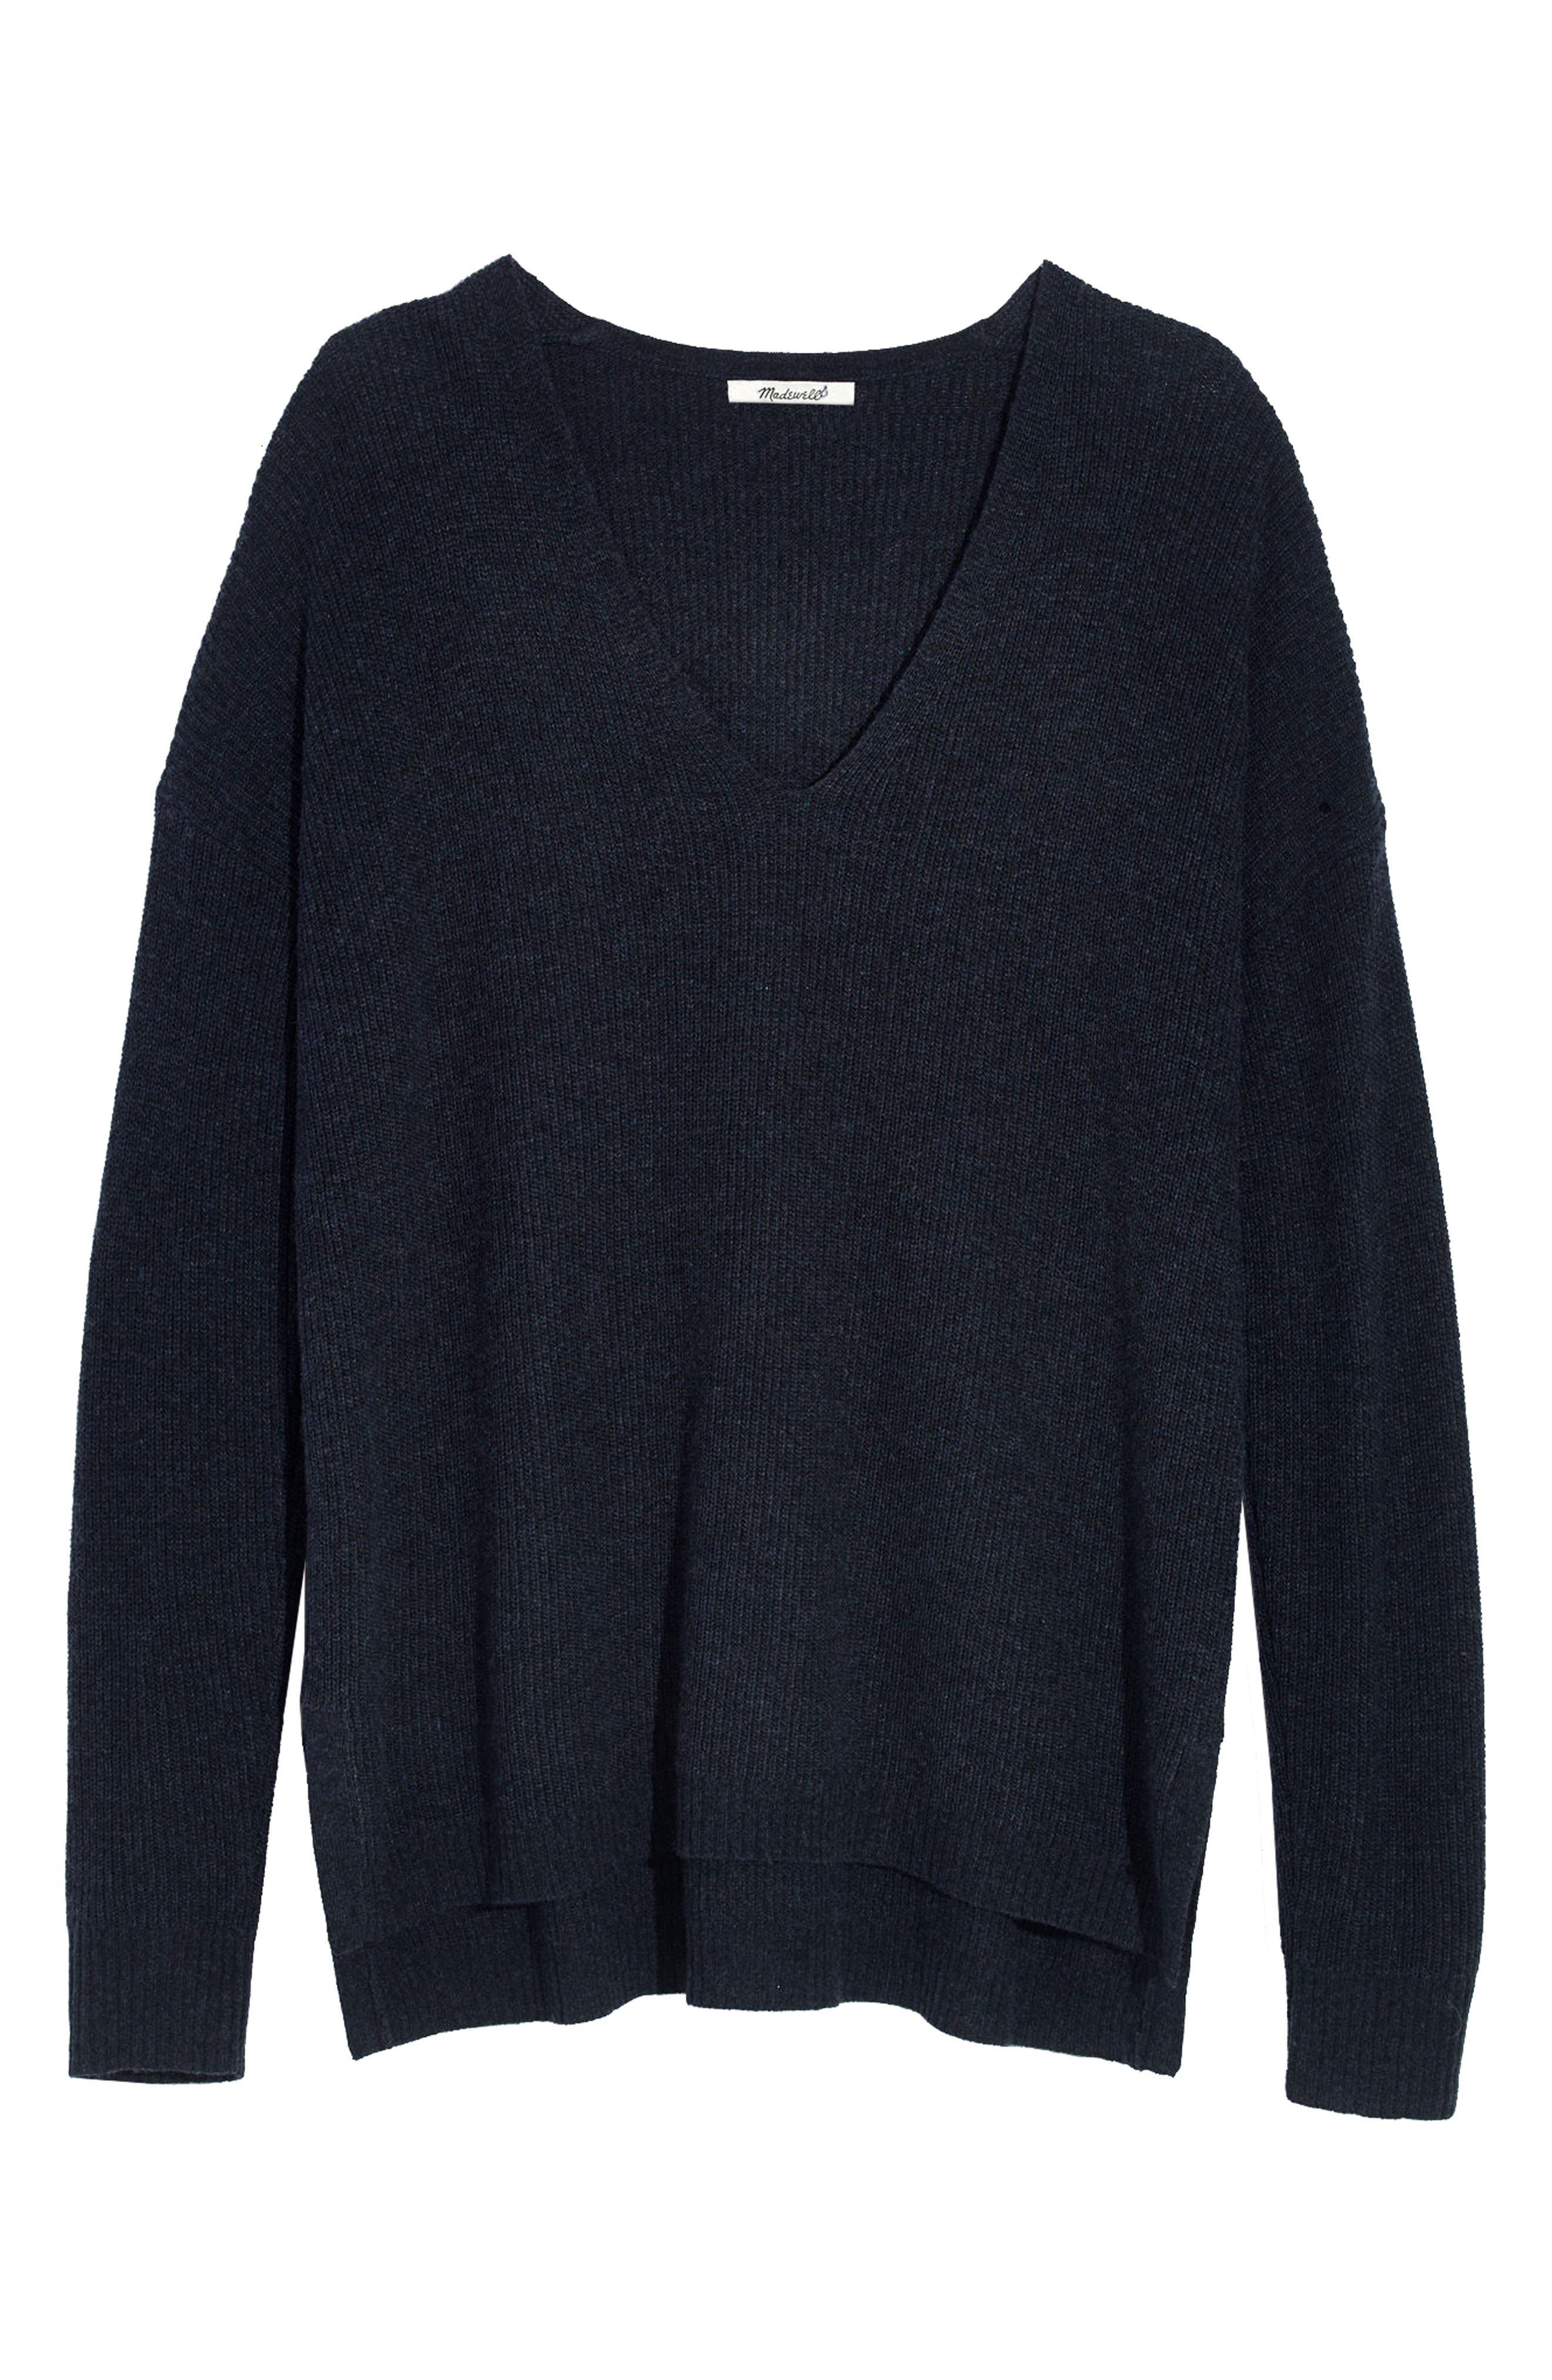 Main Image - Madewell Warmlight V-Neck Sweater